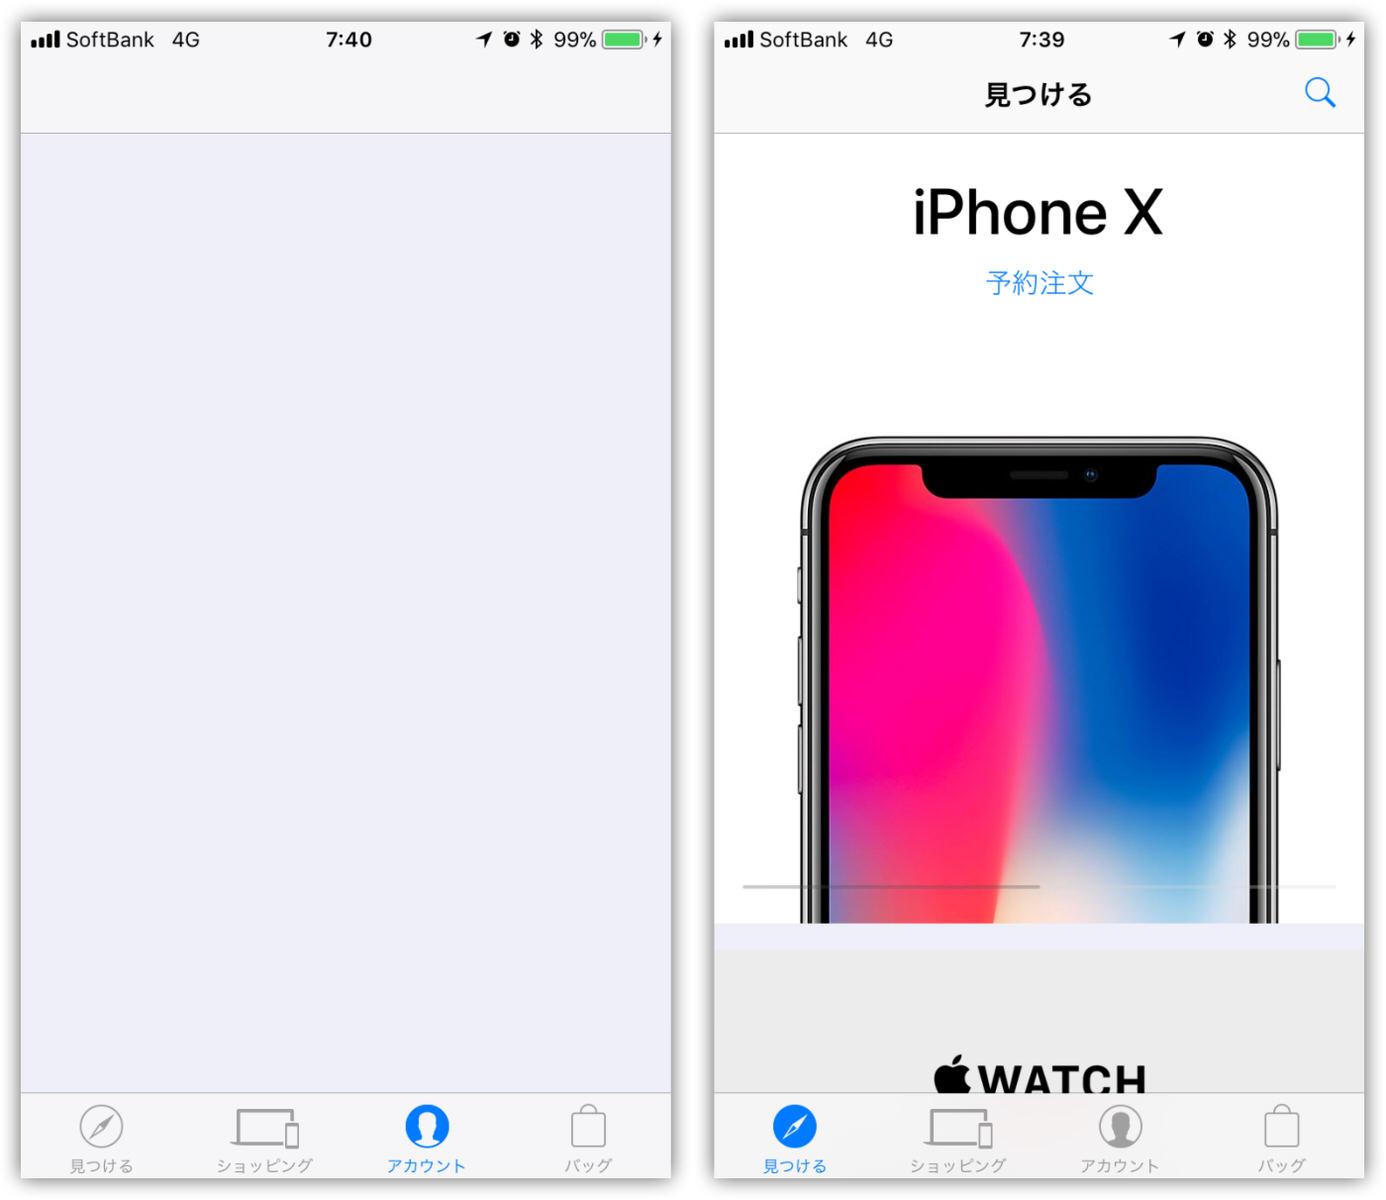 iPhone X 出荷準備中-3